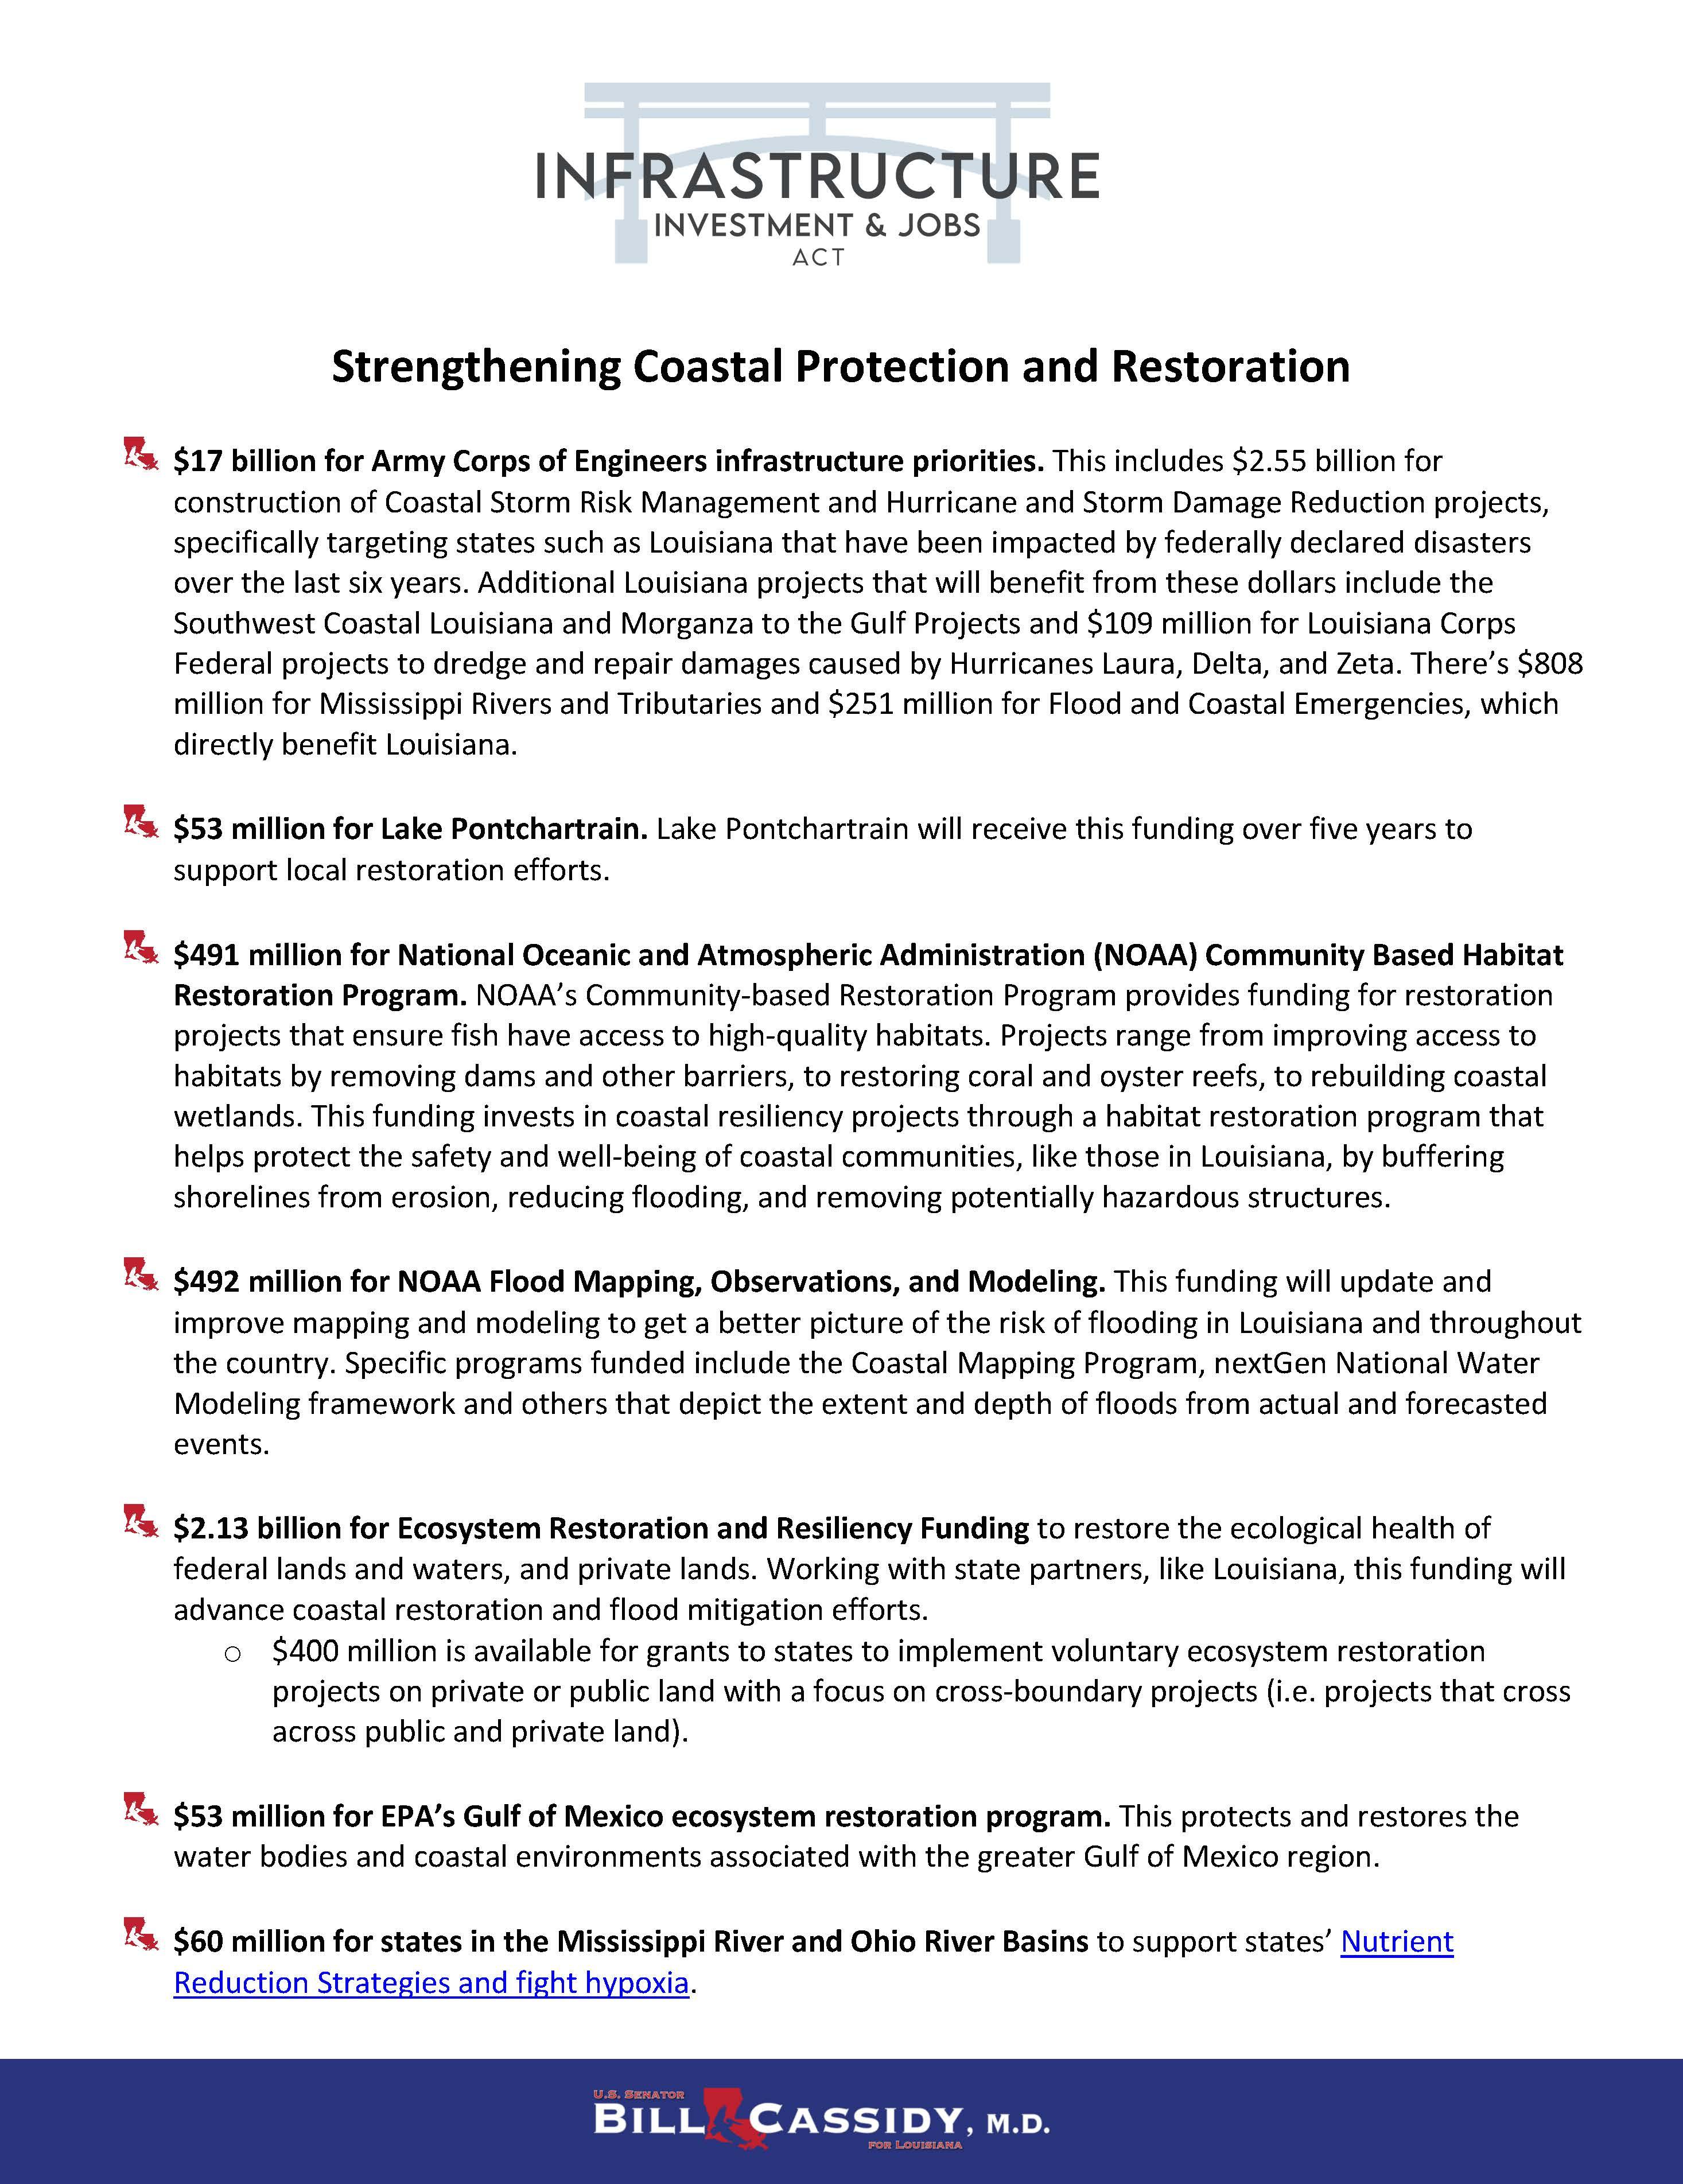 IIJA Coastal Protection and Restoration